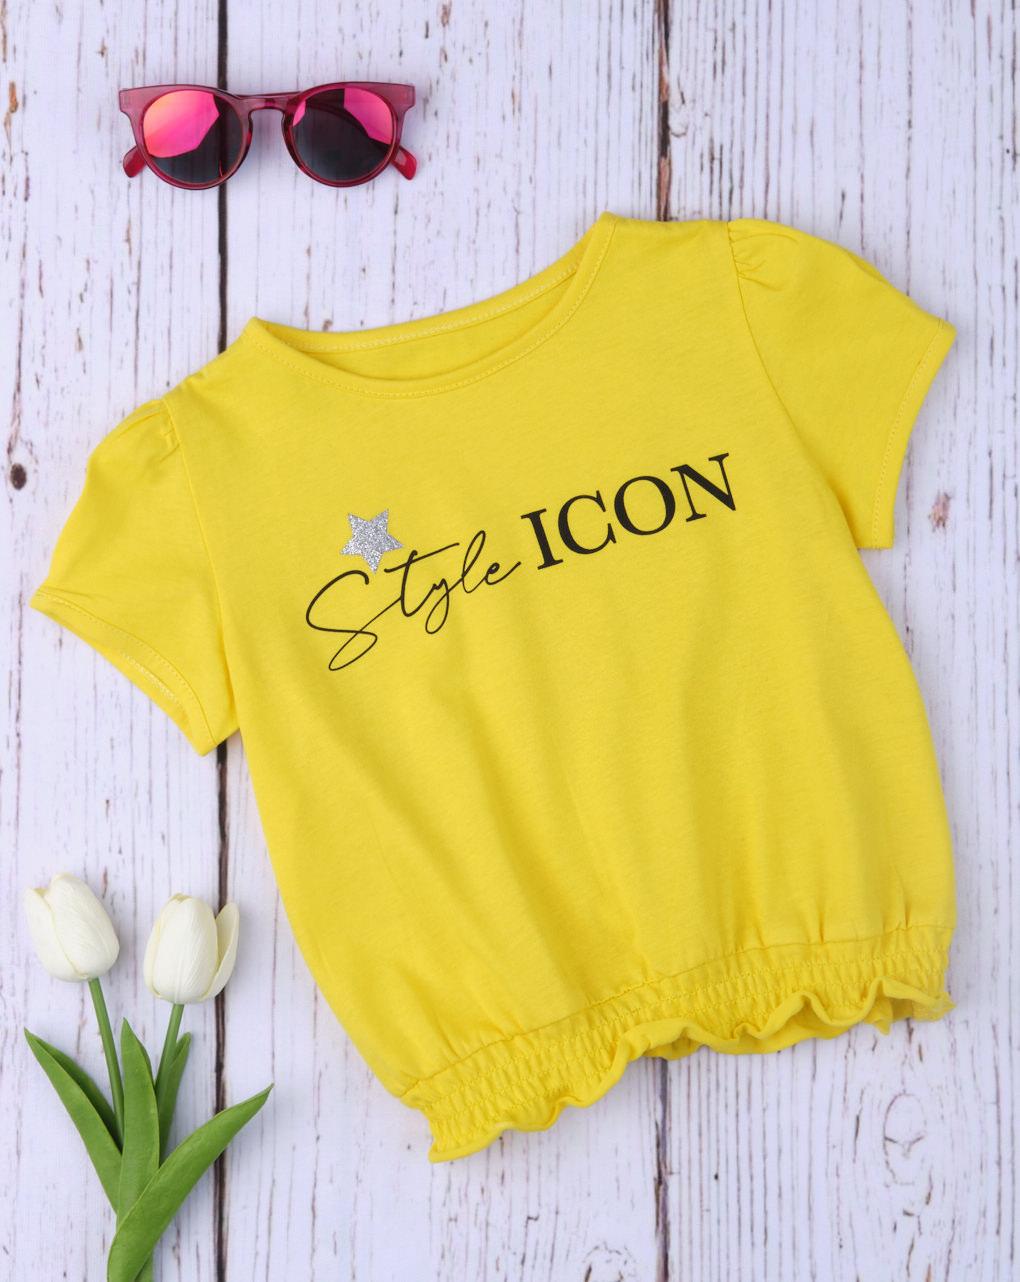 T-shirt Κίτρινο με Λάστιχο για Κορίτσι